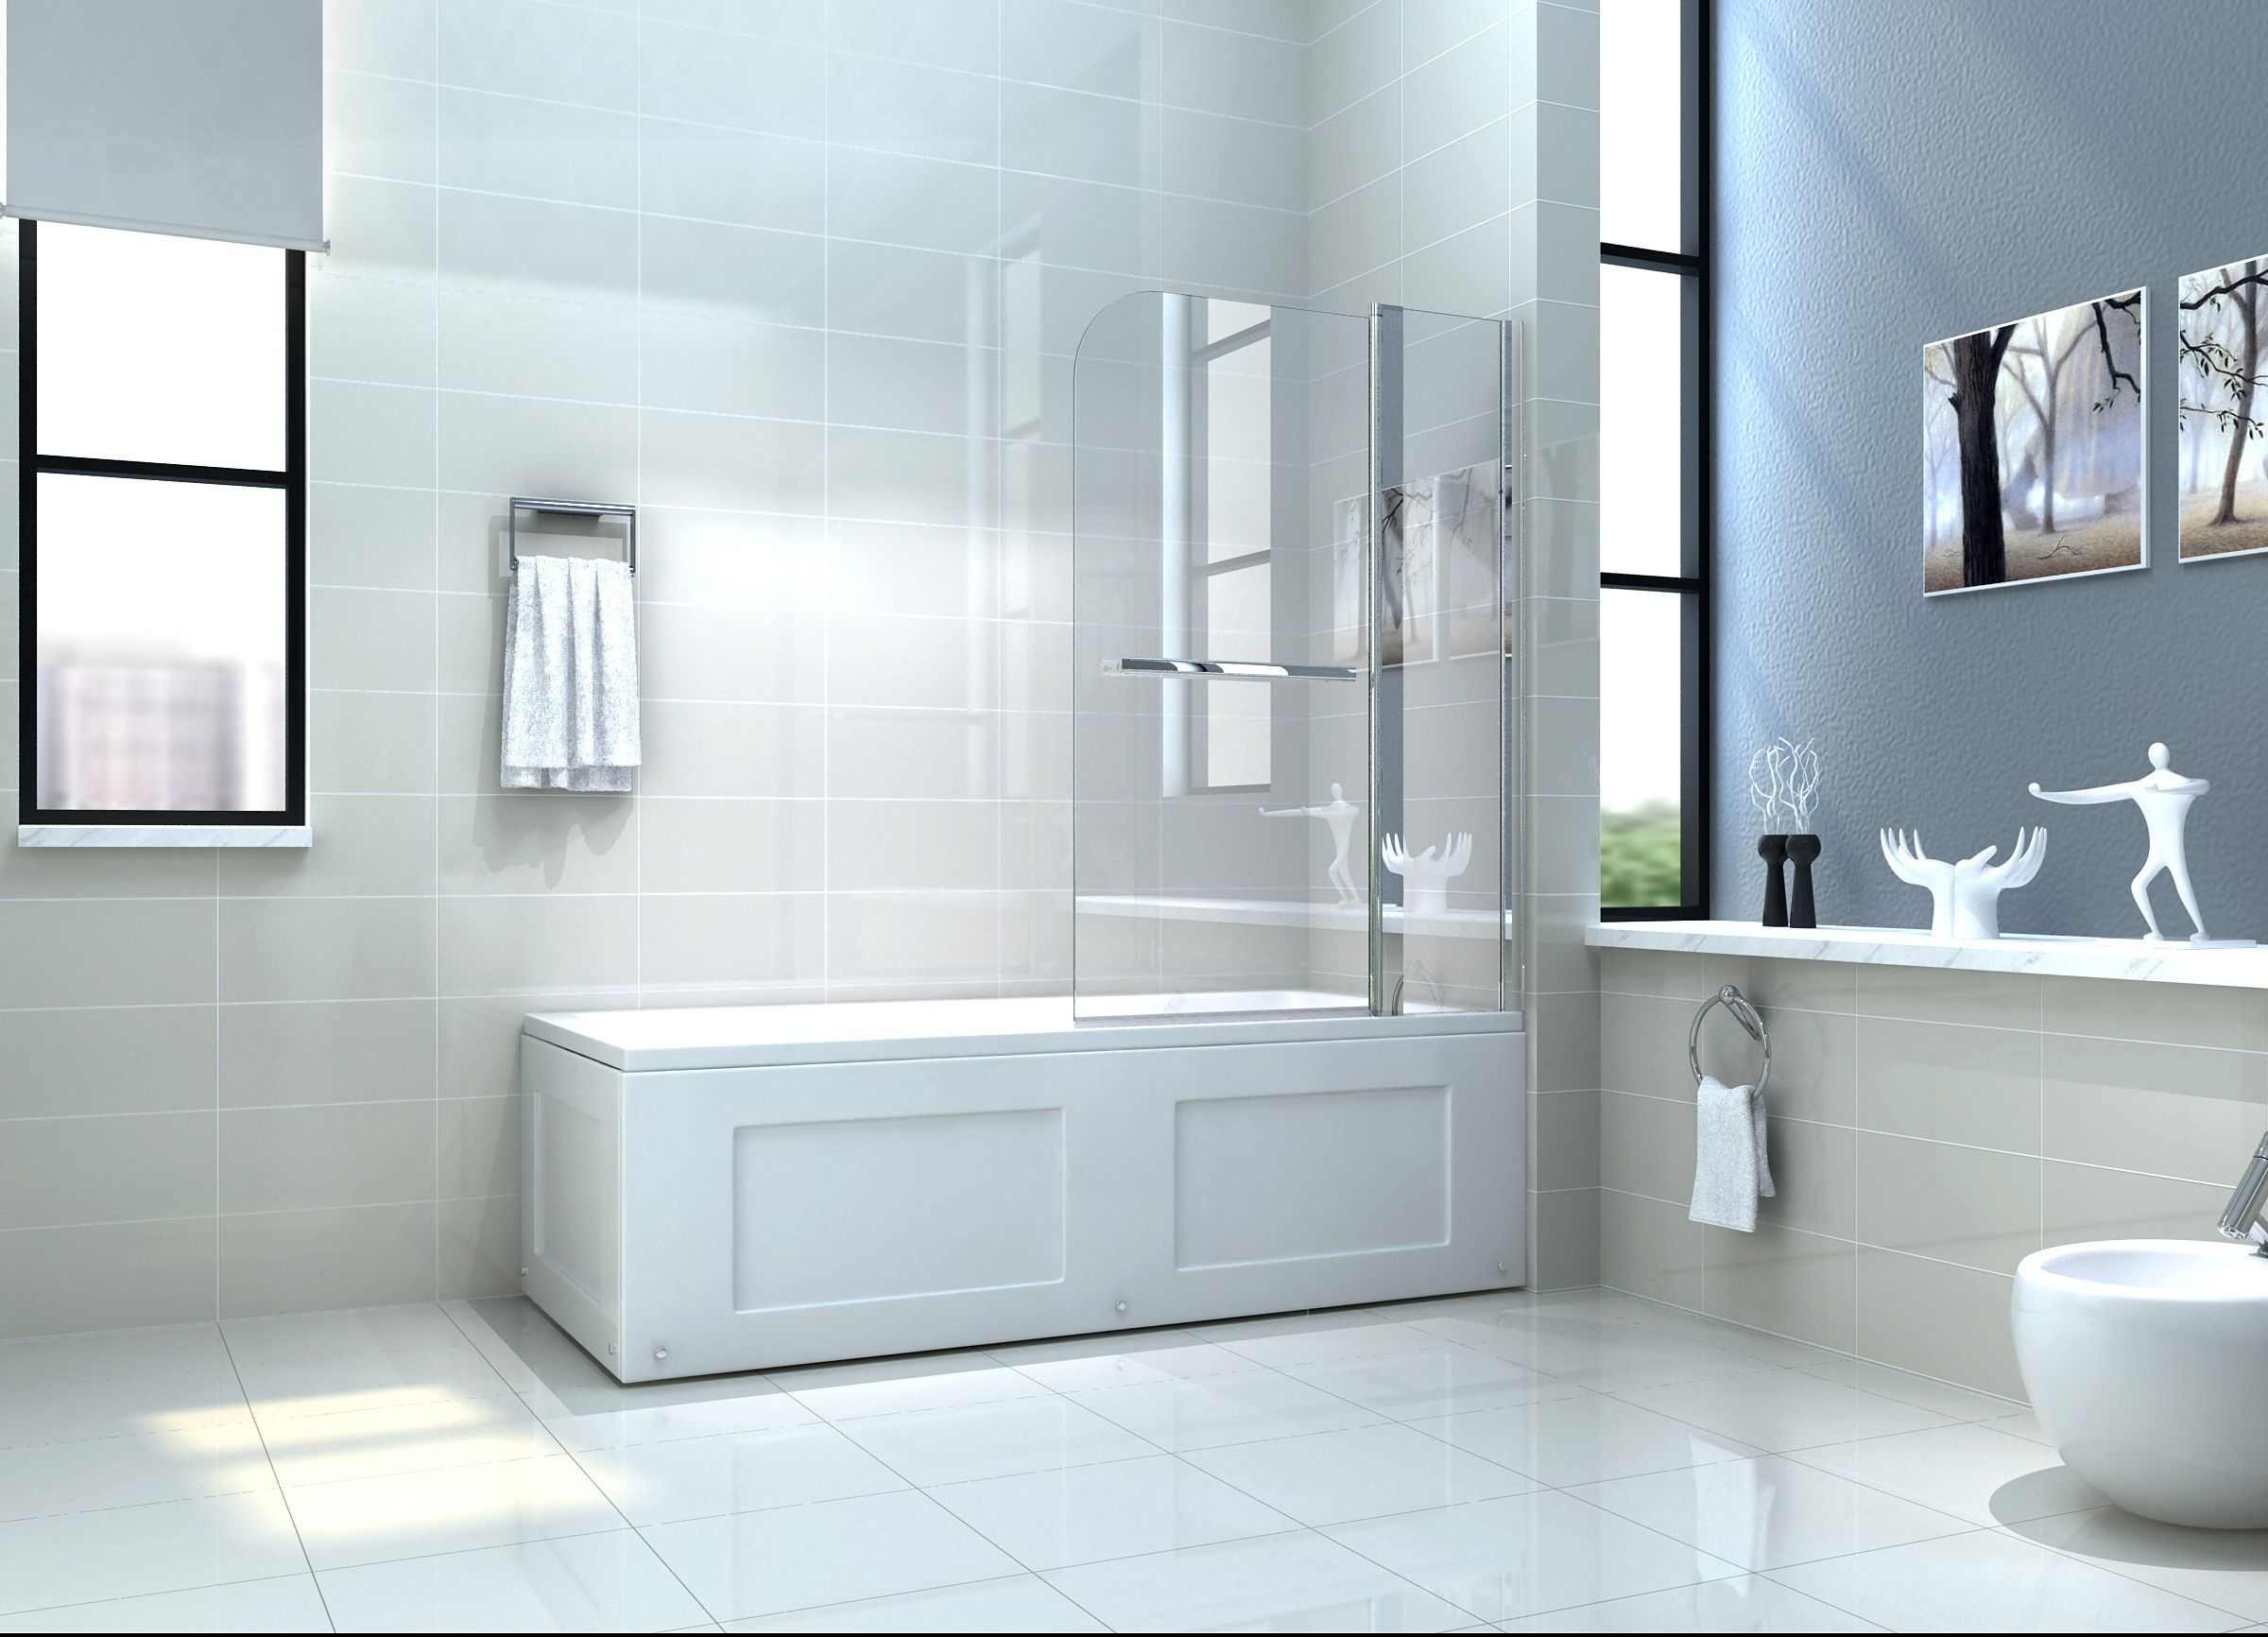 180° PIVOT 6mm GLASS DOUBLE OVER BATH SHOWER SCREEN | eBay | Charles ...